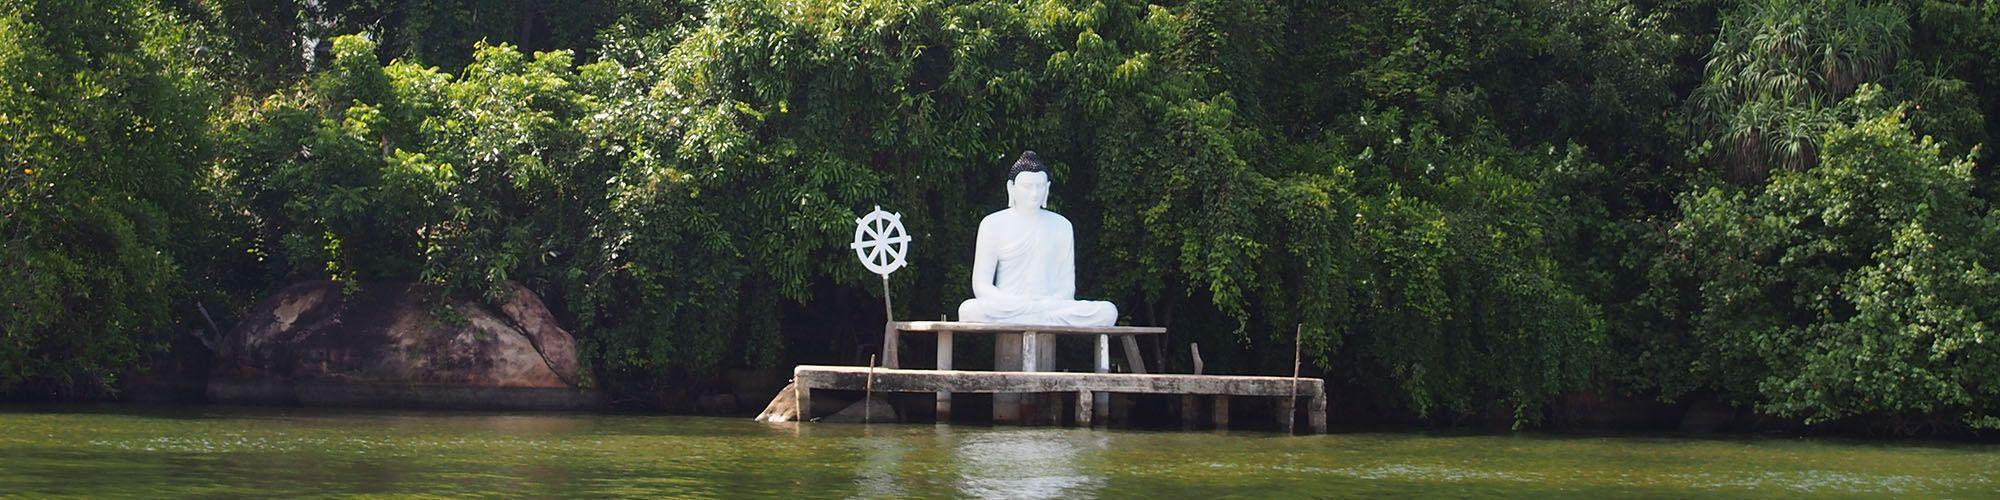 Sri Lanka, Colombo, Bentota